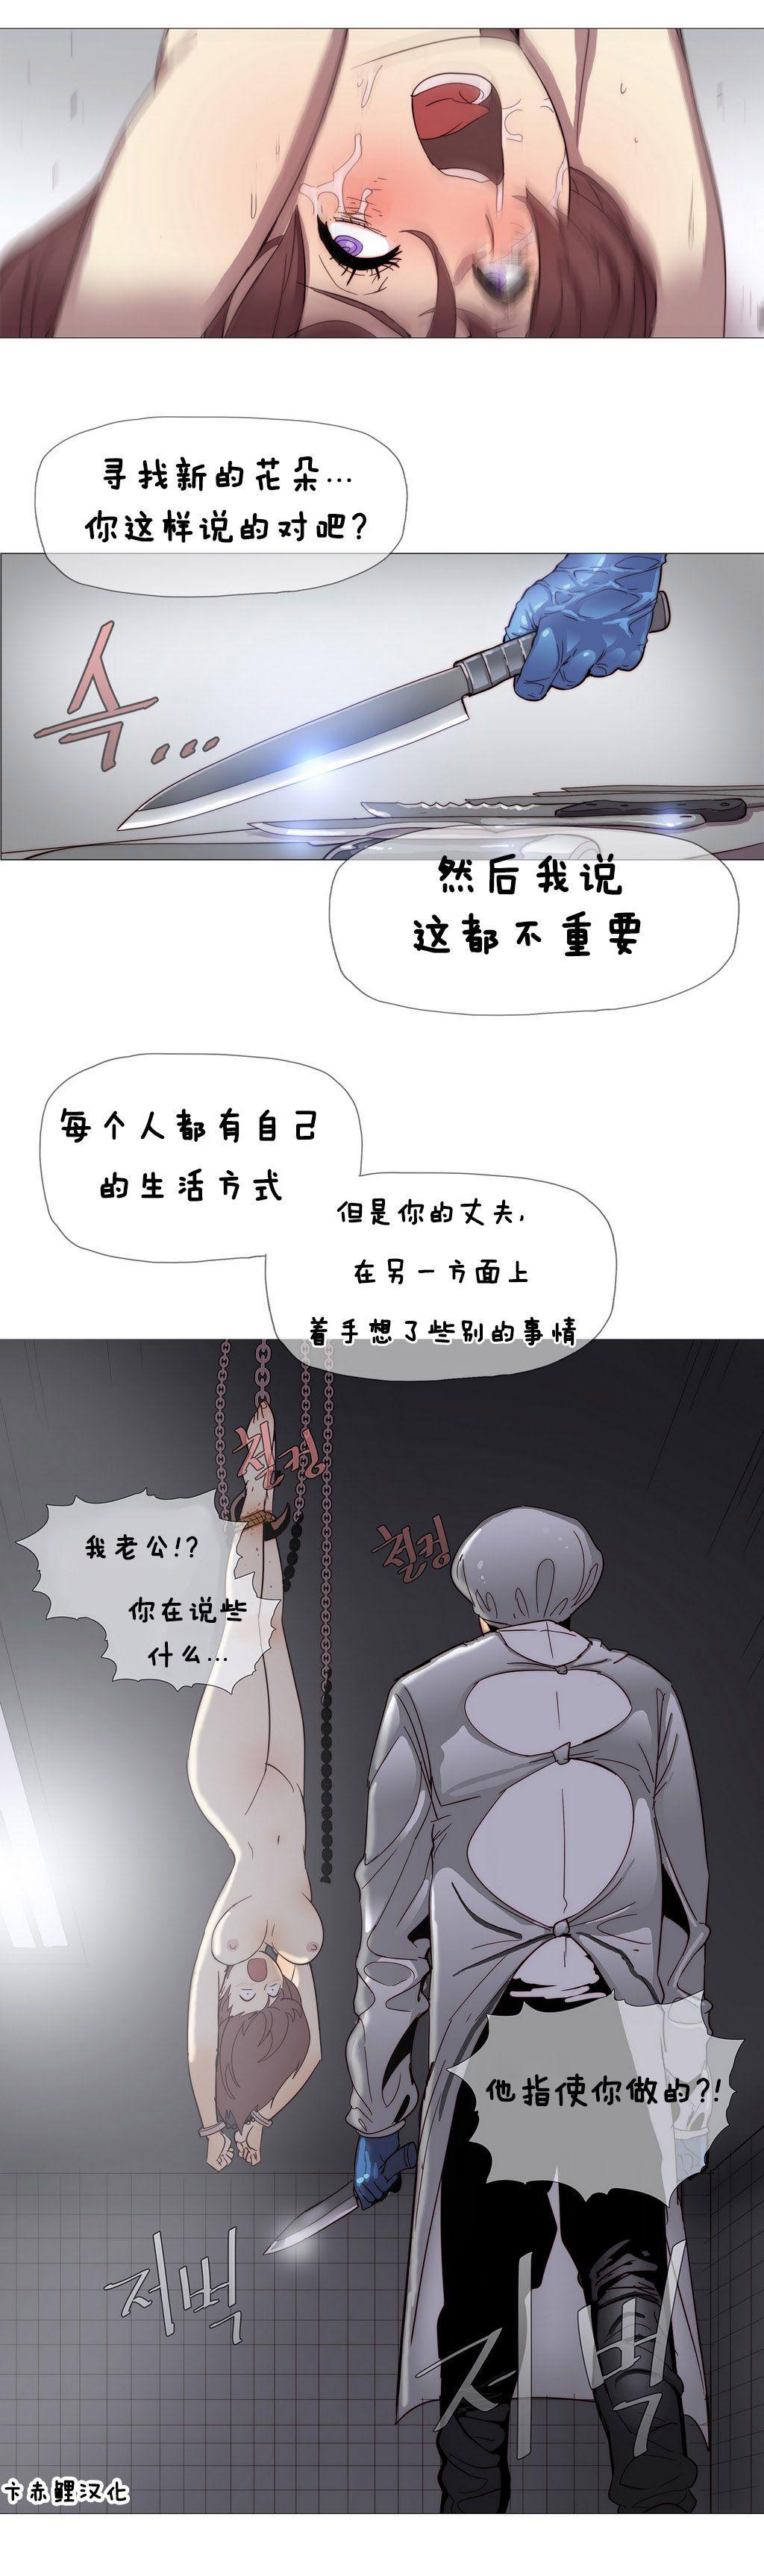 HouseHold Affairs 【卞赤鲤汉化】1~15话 40